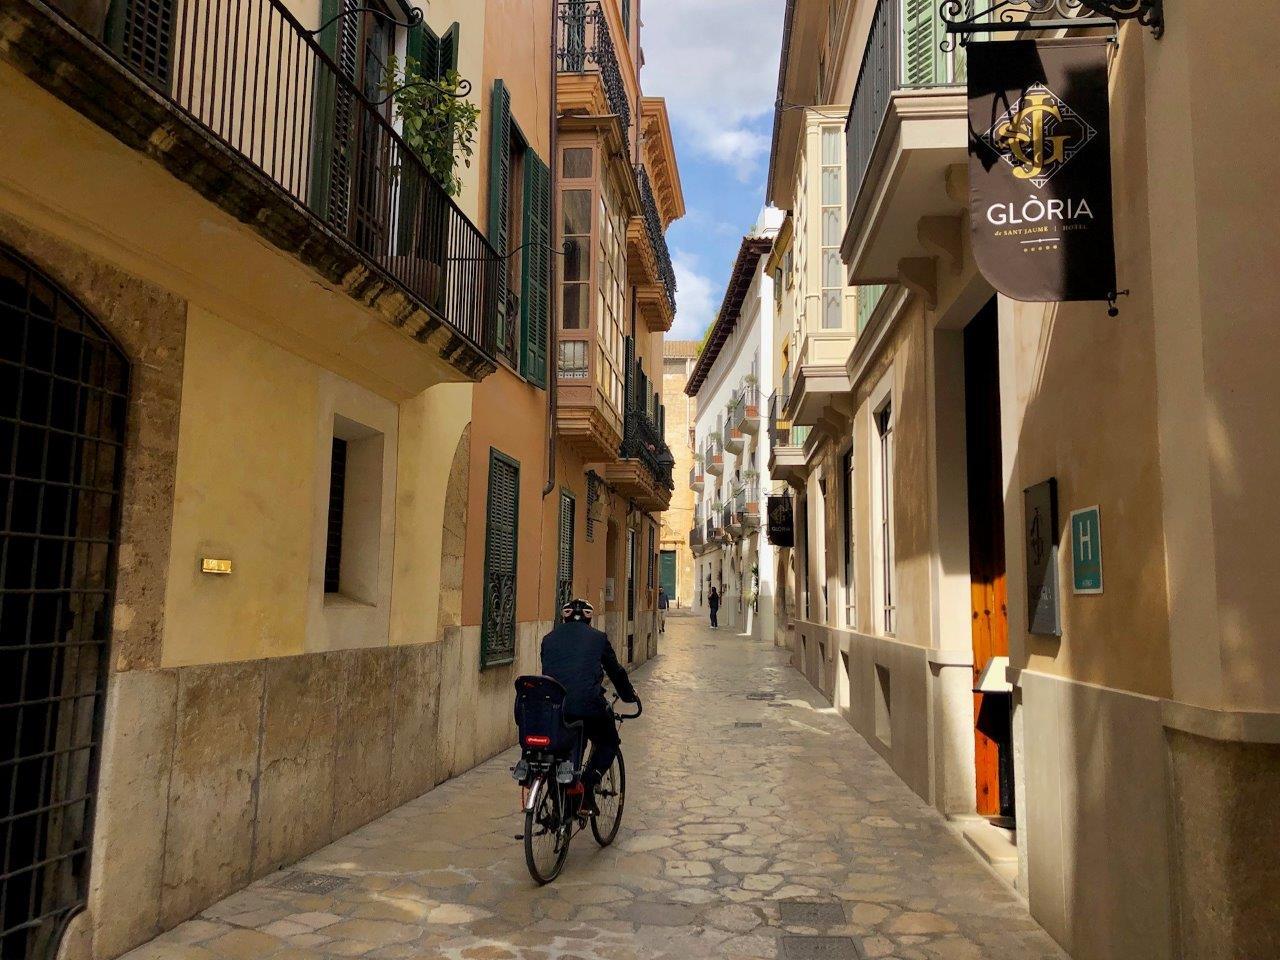 10 Reasons to Stay at Glòria de Sant Jaume Hotel, Palma de Mallorca